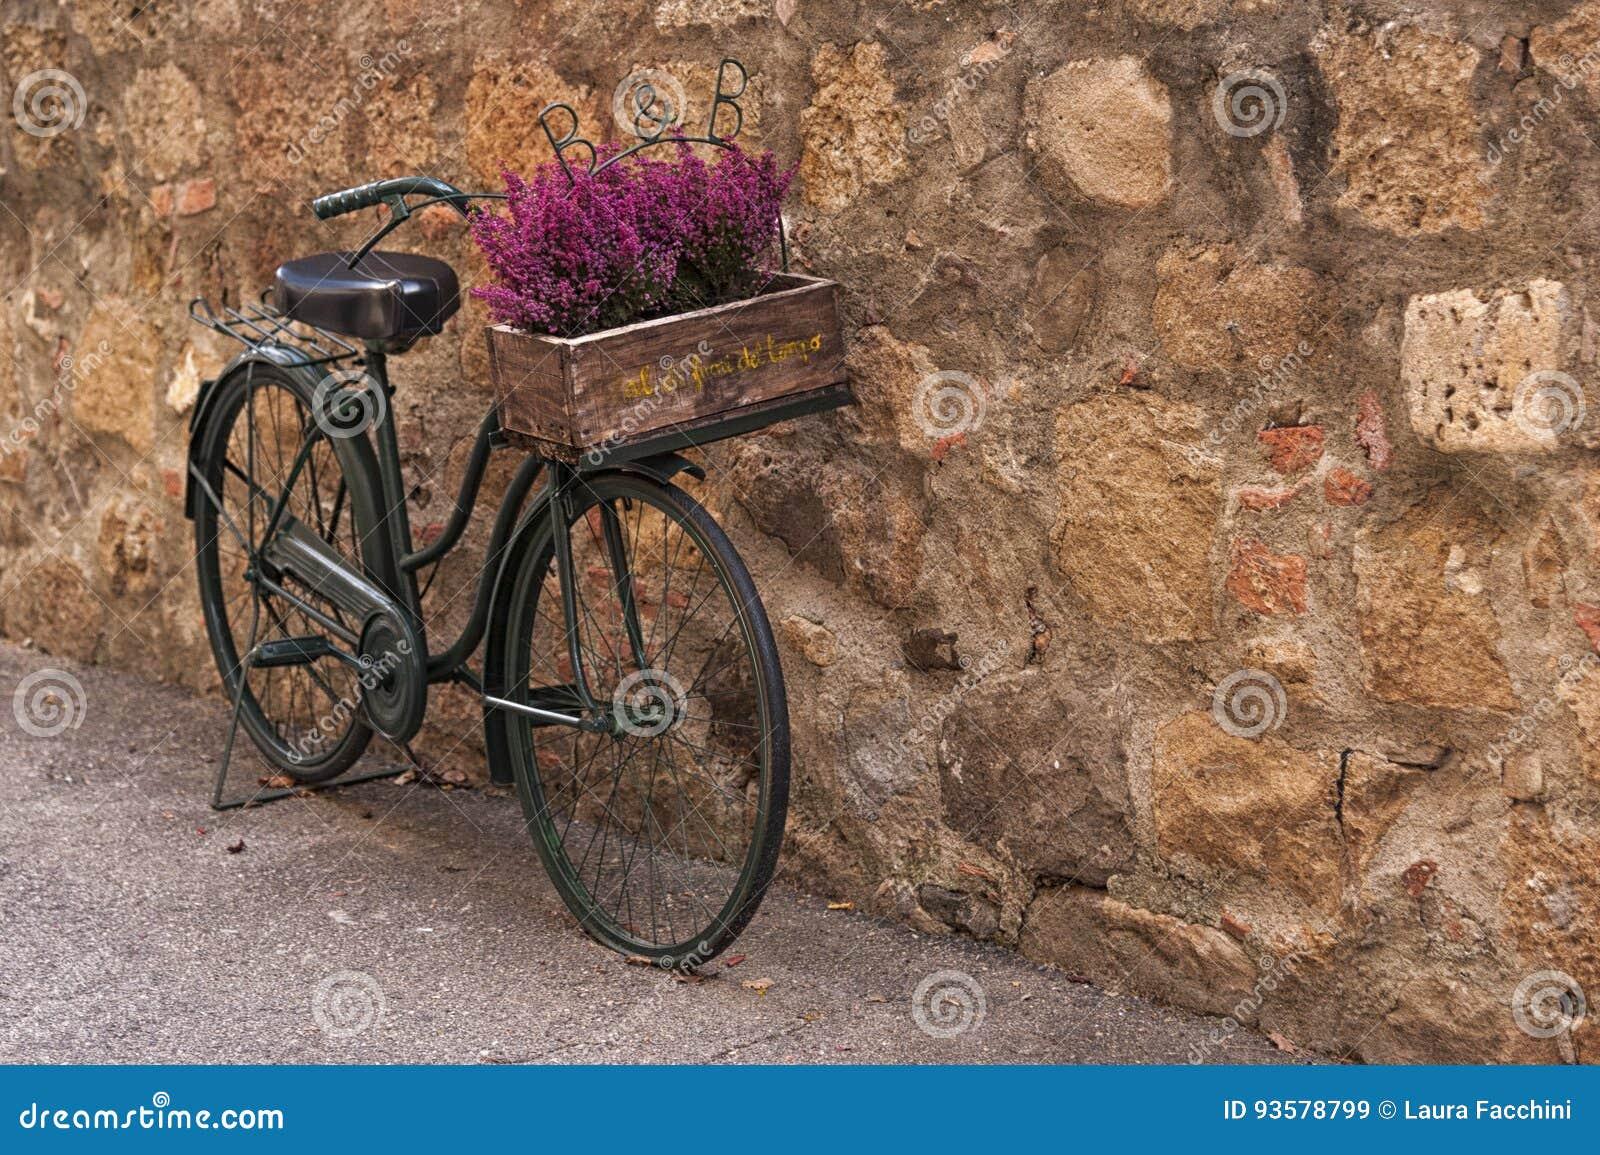 Montichiello - Ιταλία, στις 29 Οκτωβρίου 2016: Ένα όμορφο ποδήλατο με τα λουλούδια σε μια ήρεμη οδό σε Montichiello, Τοσκάνη